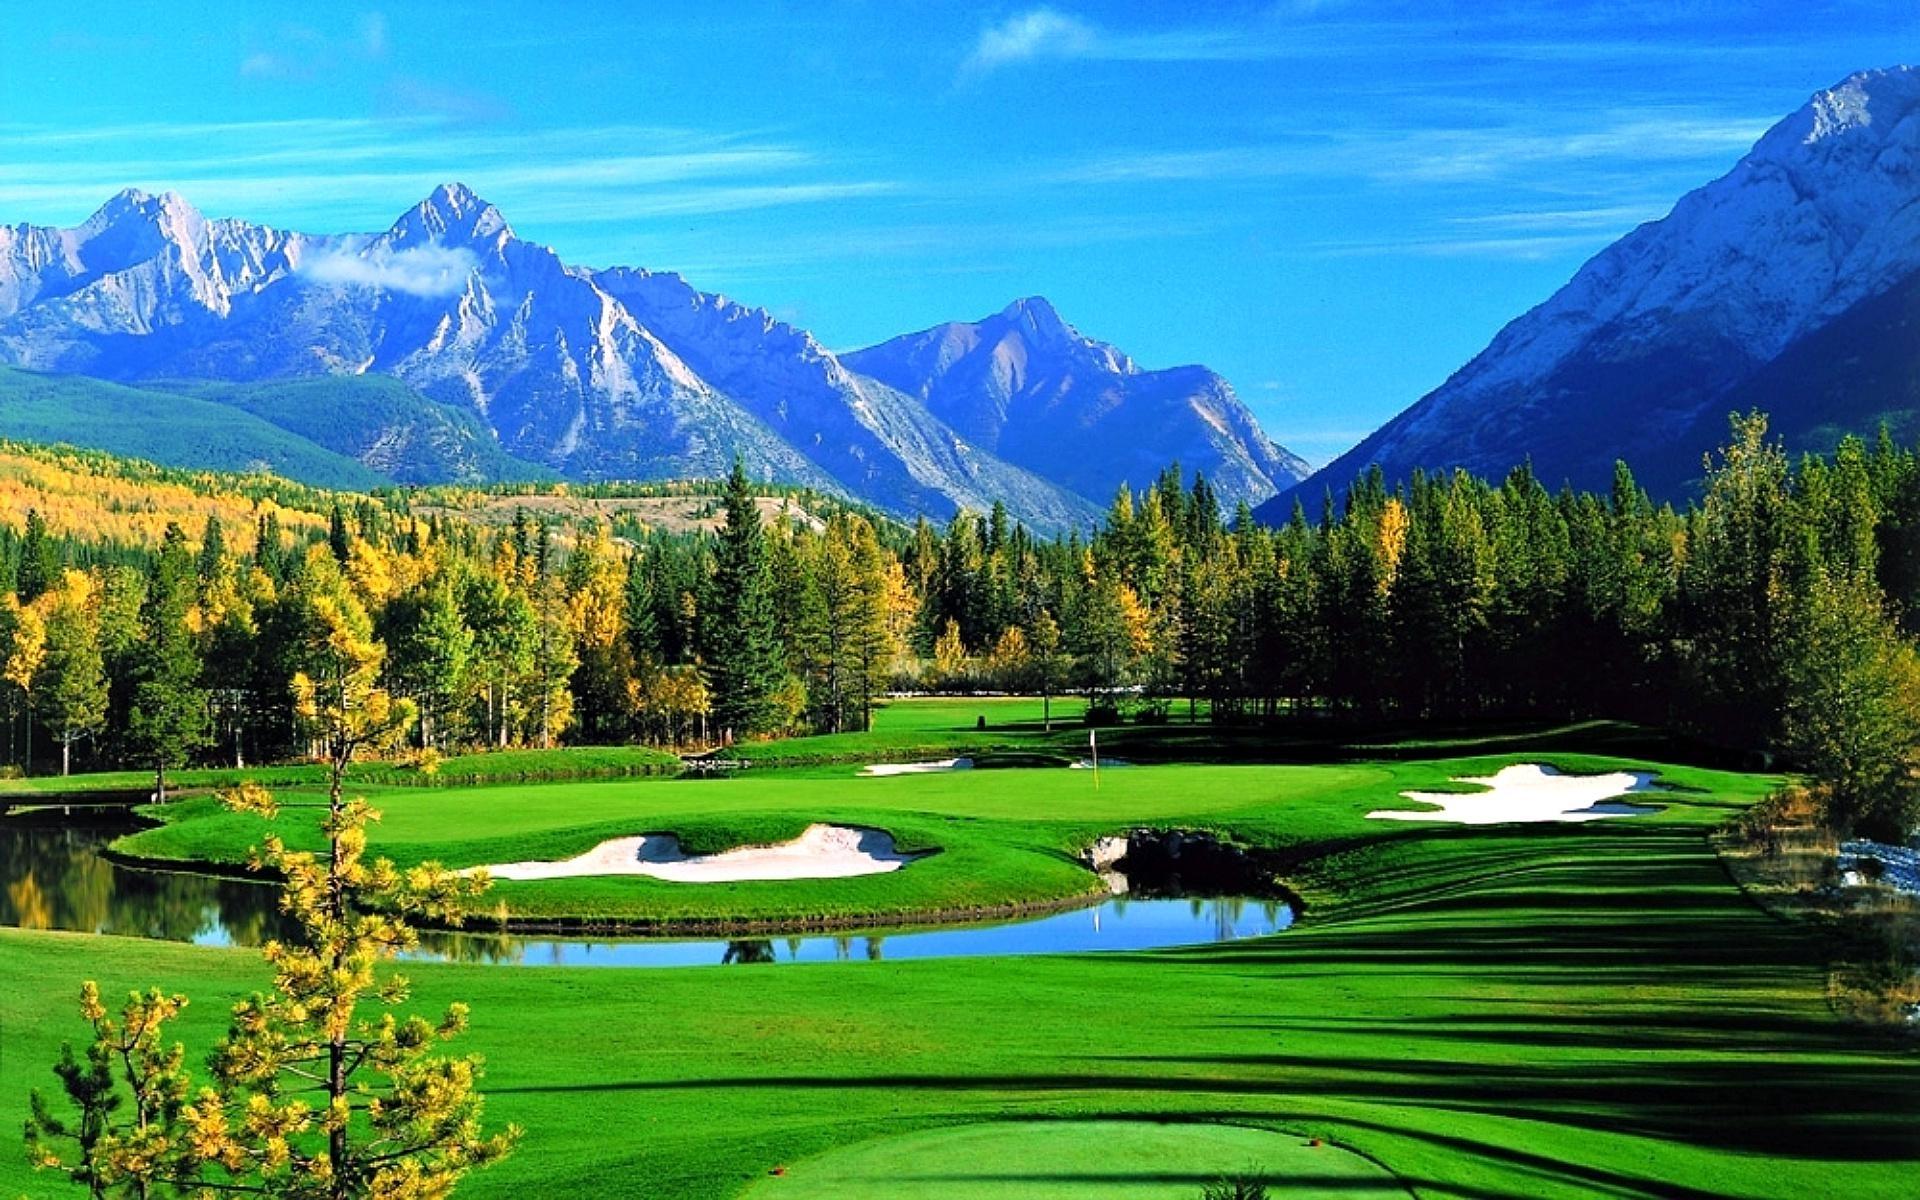 golf course wallpaper hd backgrounds. - media file | pixelstalk